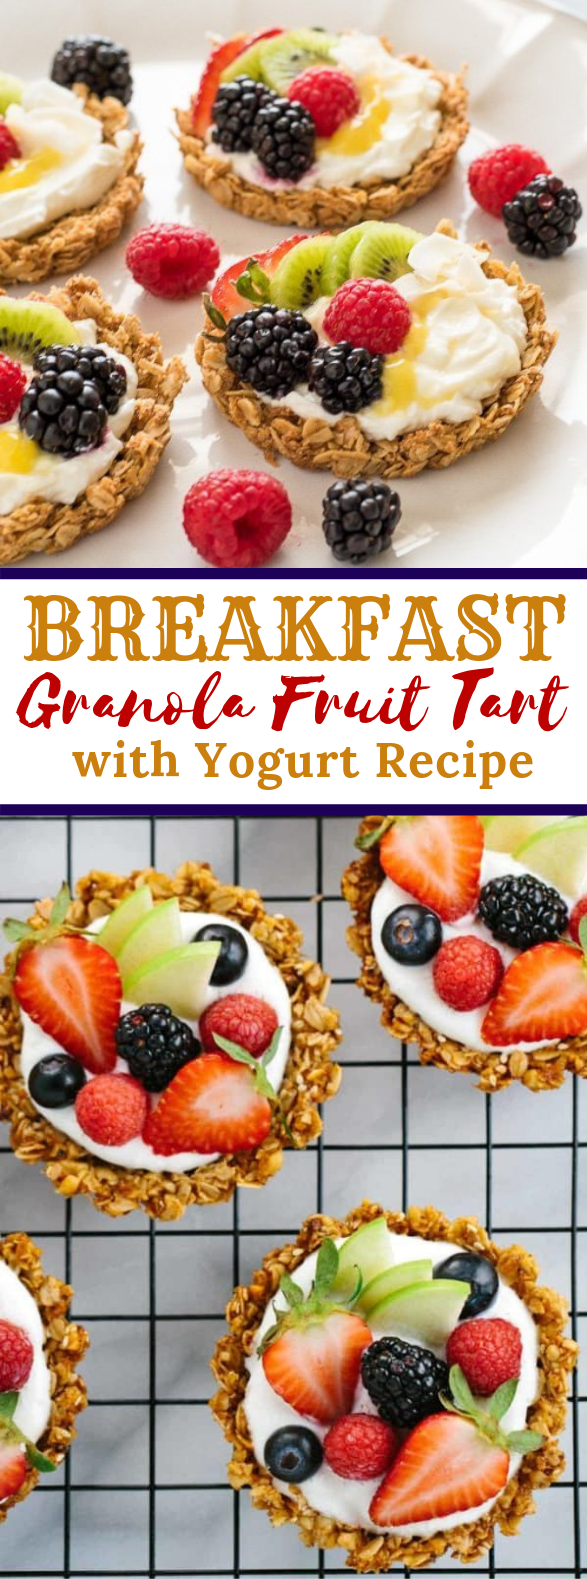 Breakfast Granola Fruit Tart with Yogurt #healthydessert #breakfast